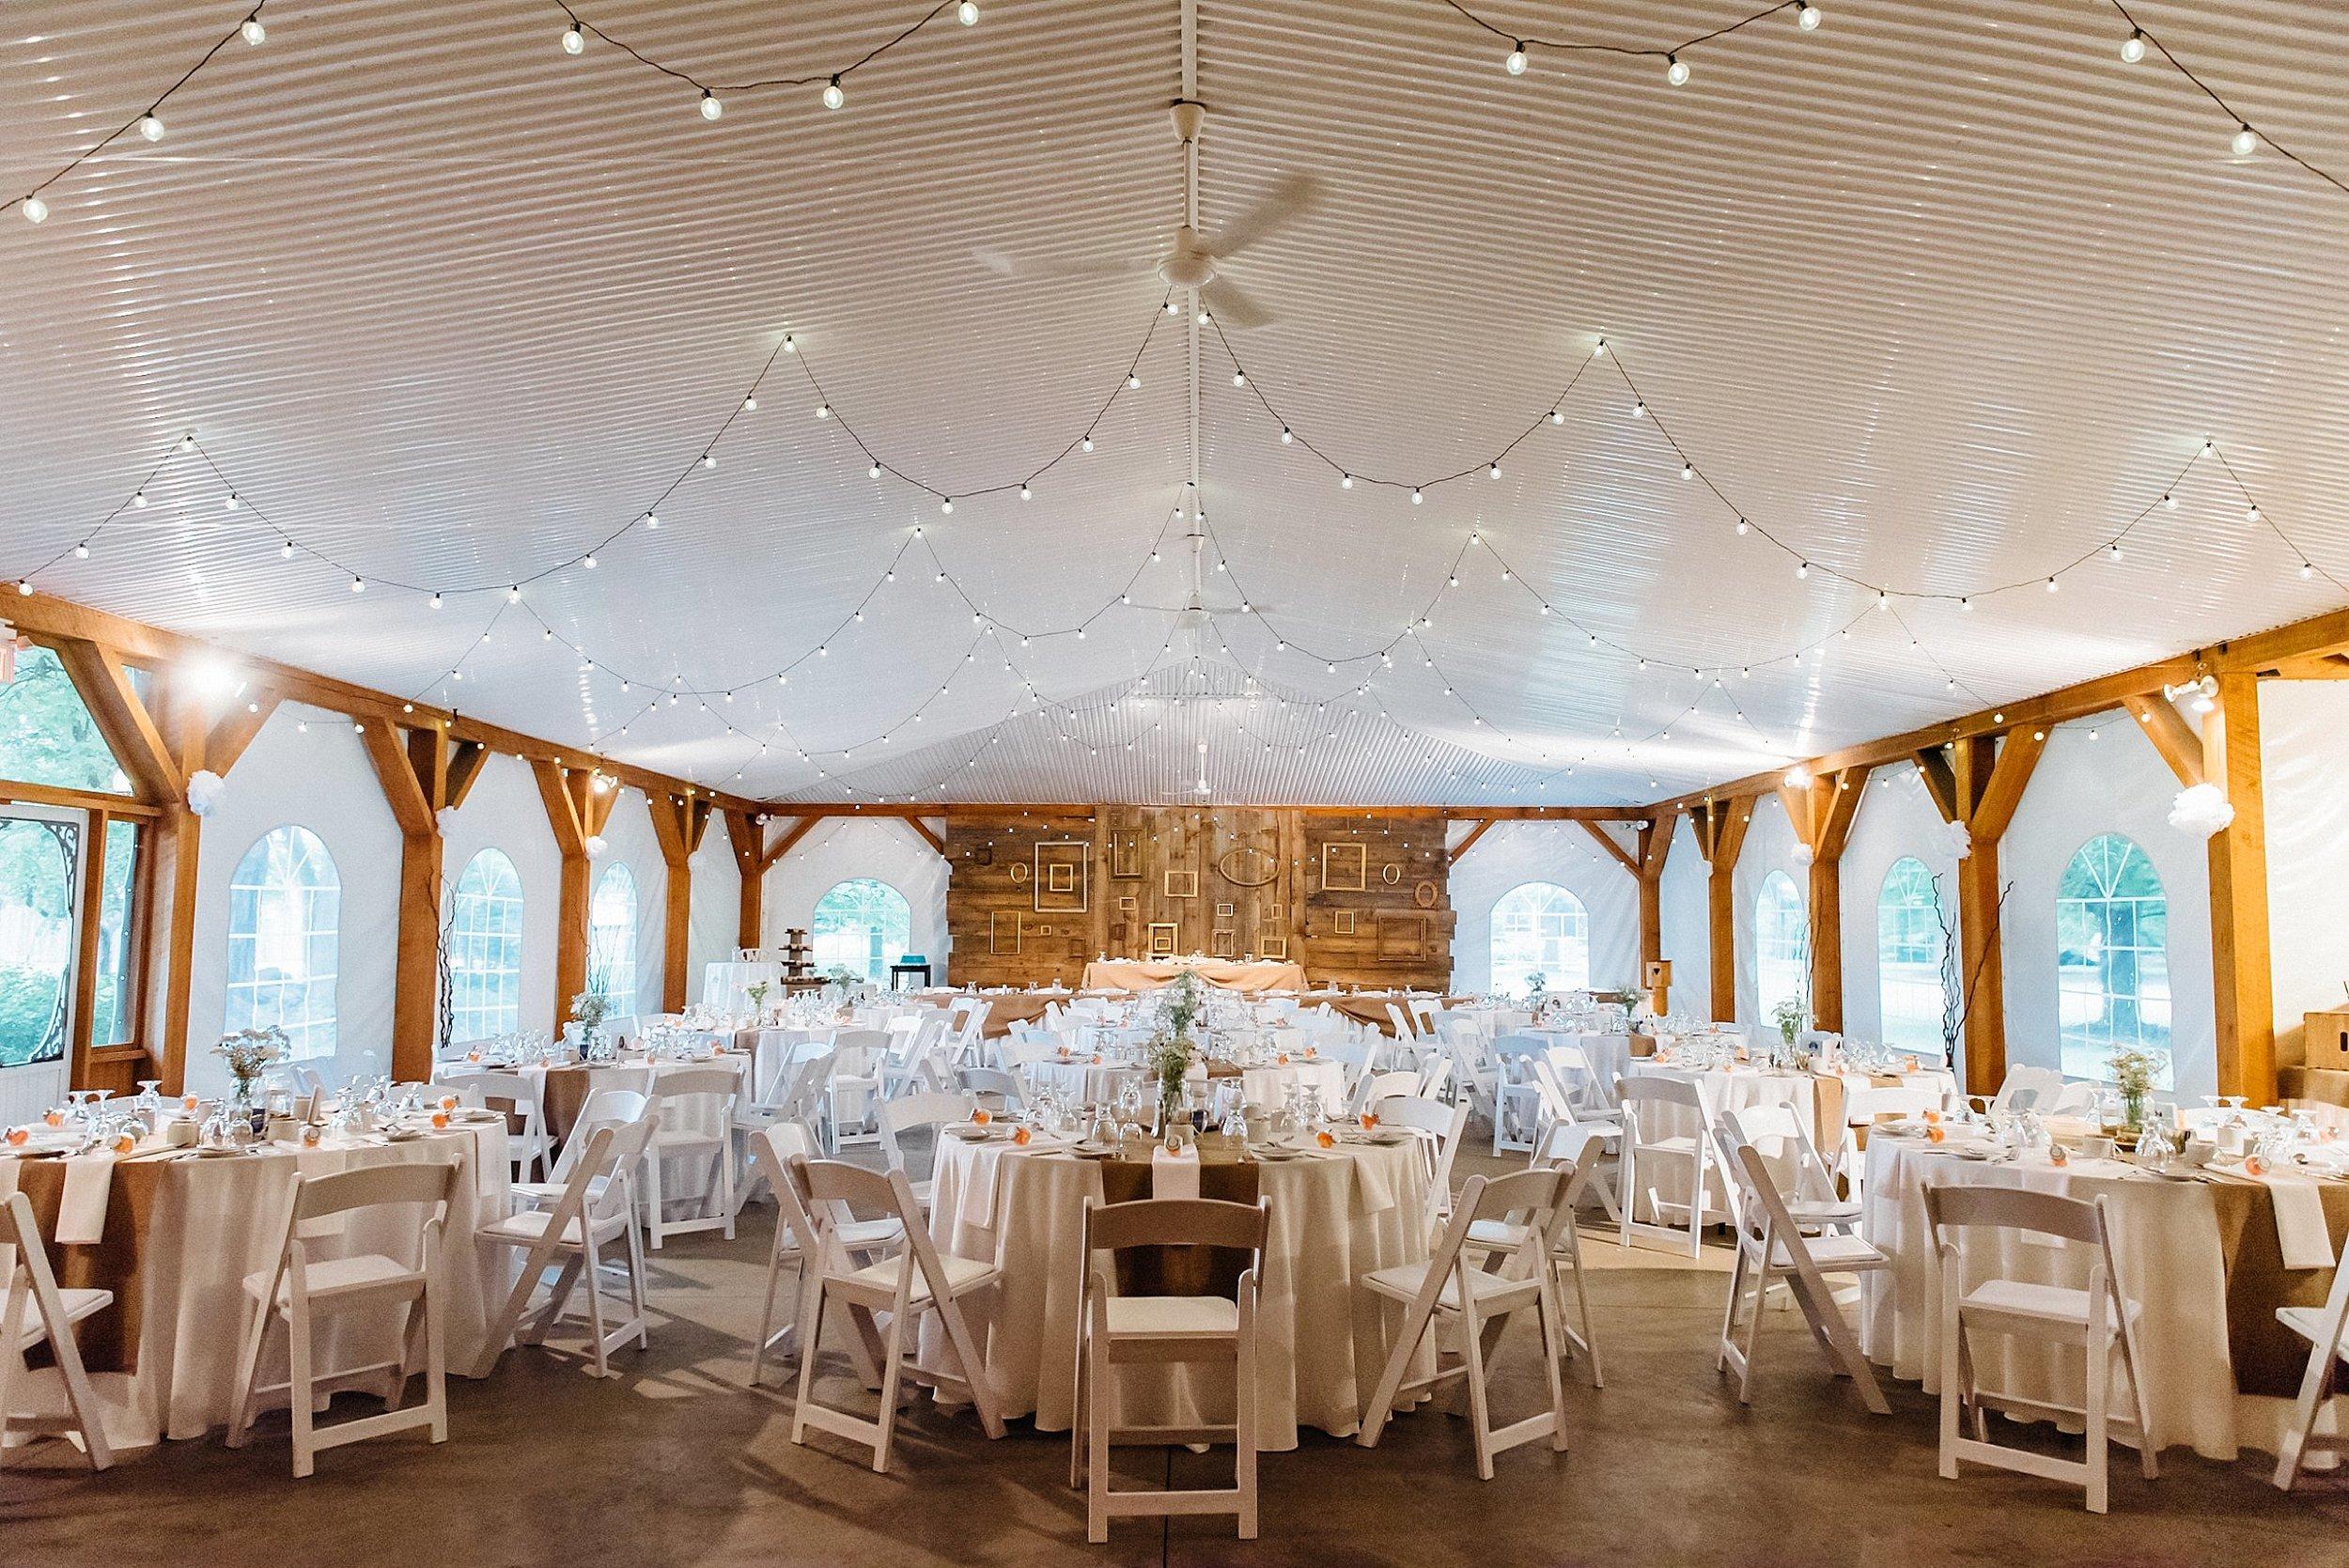 Ottawa Wedding Photographer - Stanley's Olde Maple Lane Barn Wedding - Ali & Batoul Photography_0006.jpg